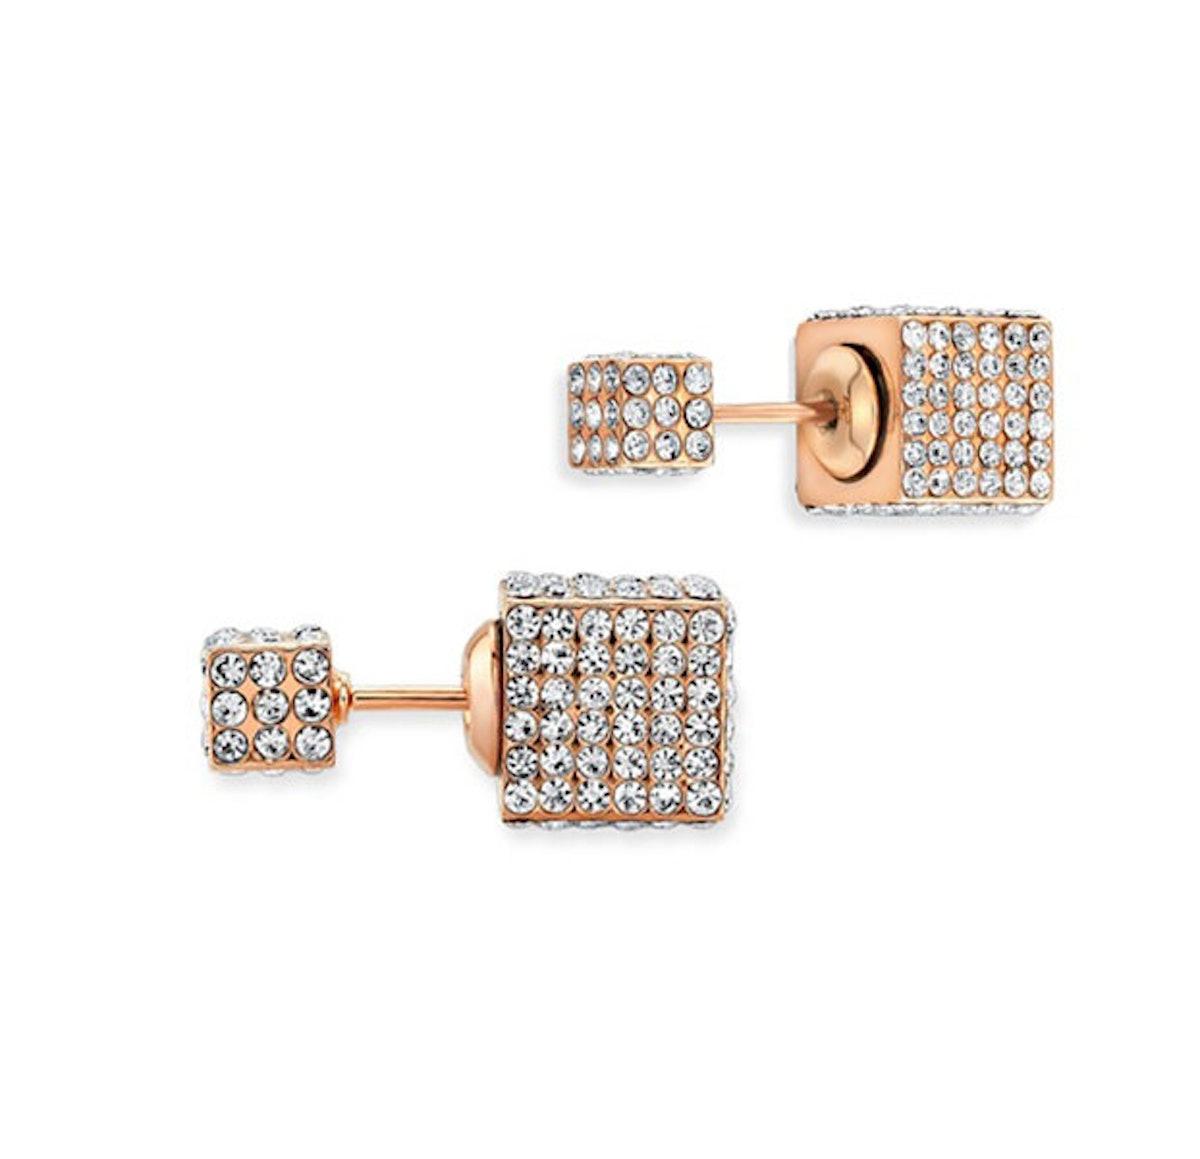 Vita Fede earrings